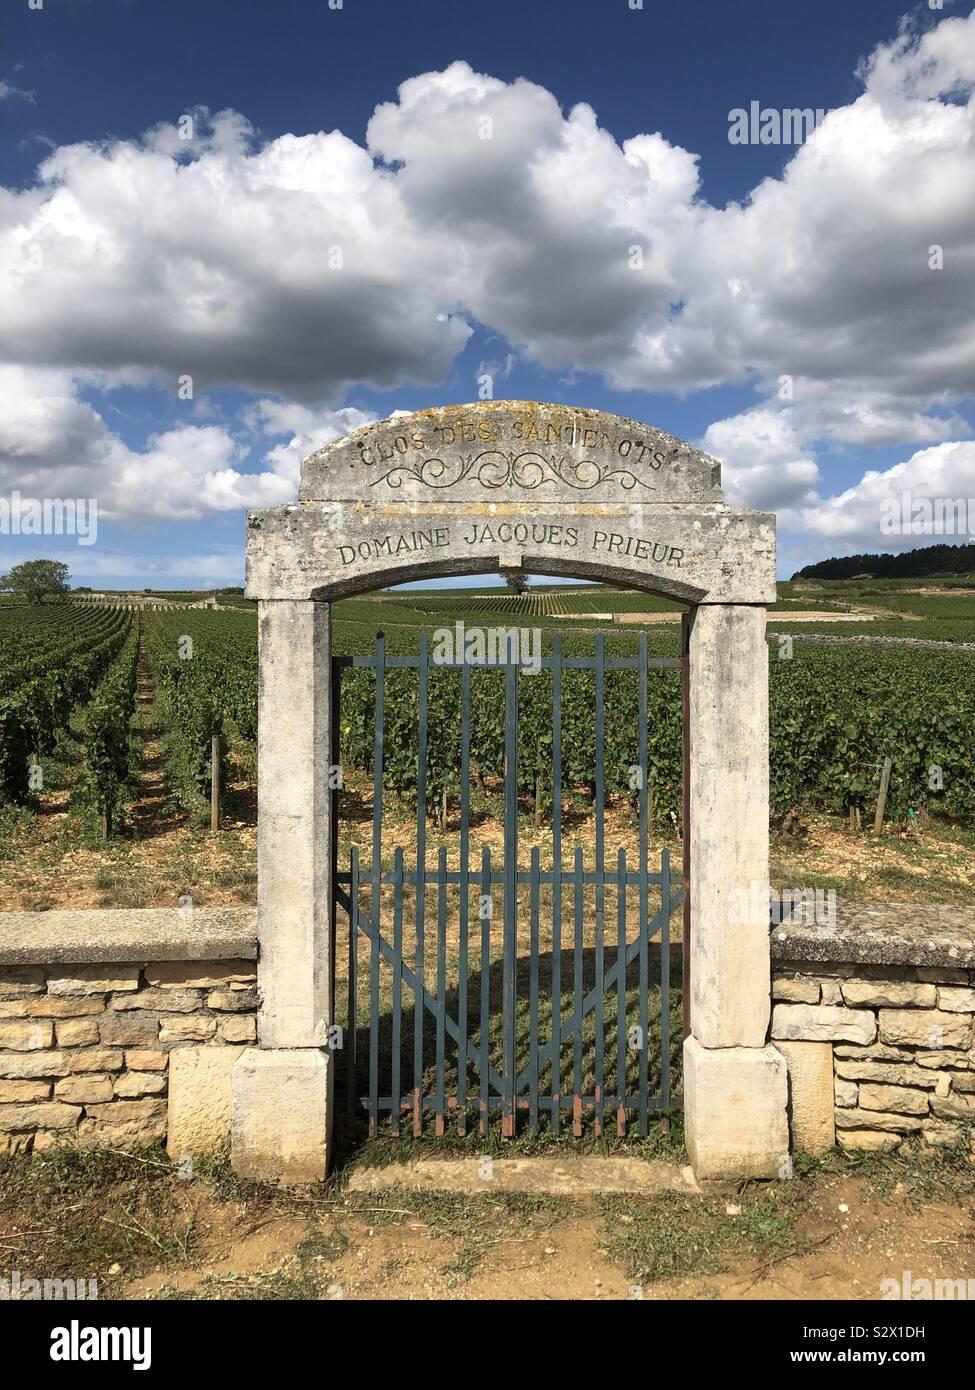 Gateway zu Domaine Jacques Prieur, Beaune, Frankreich. Stockfoto